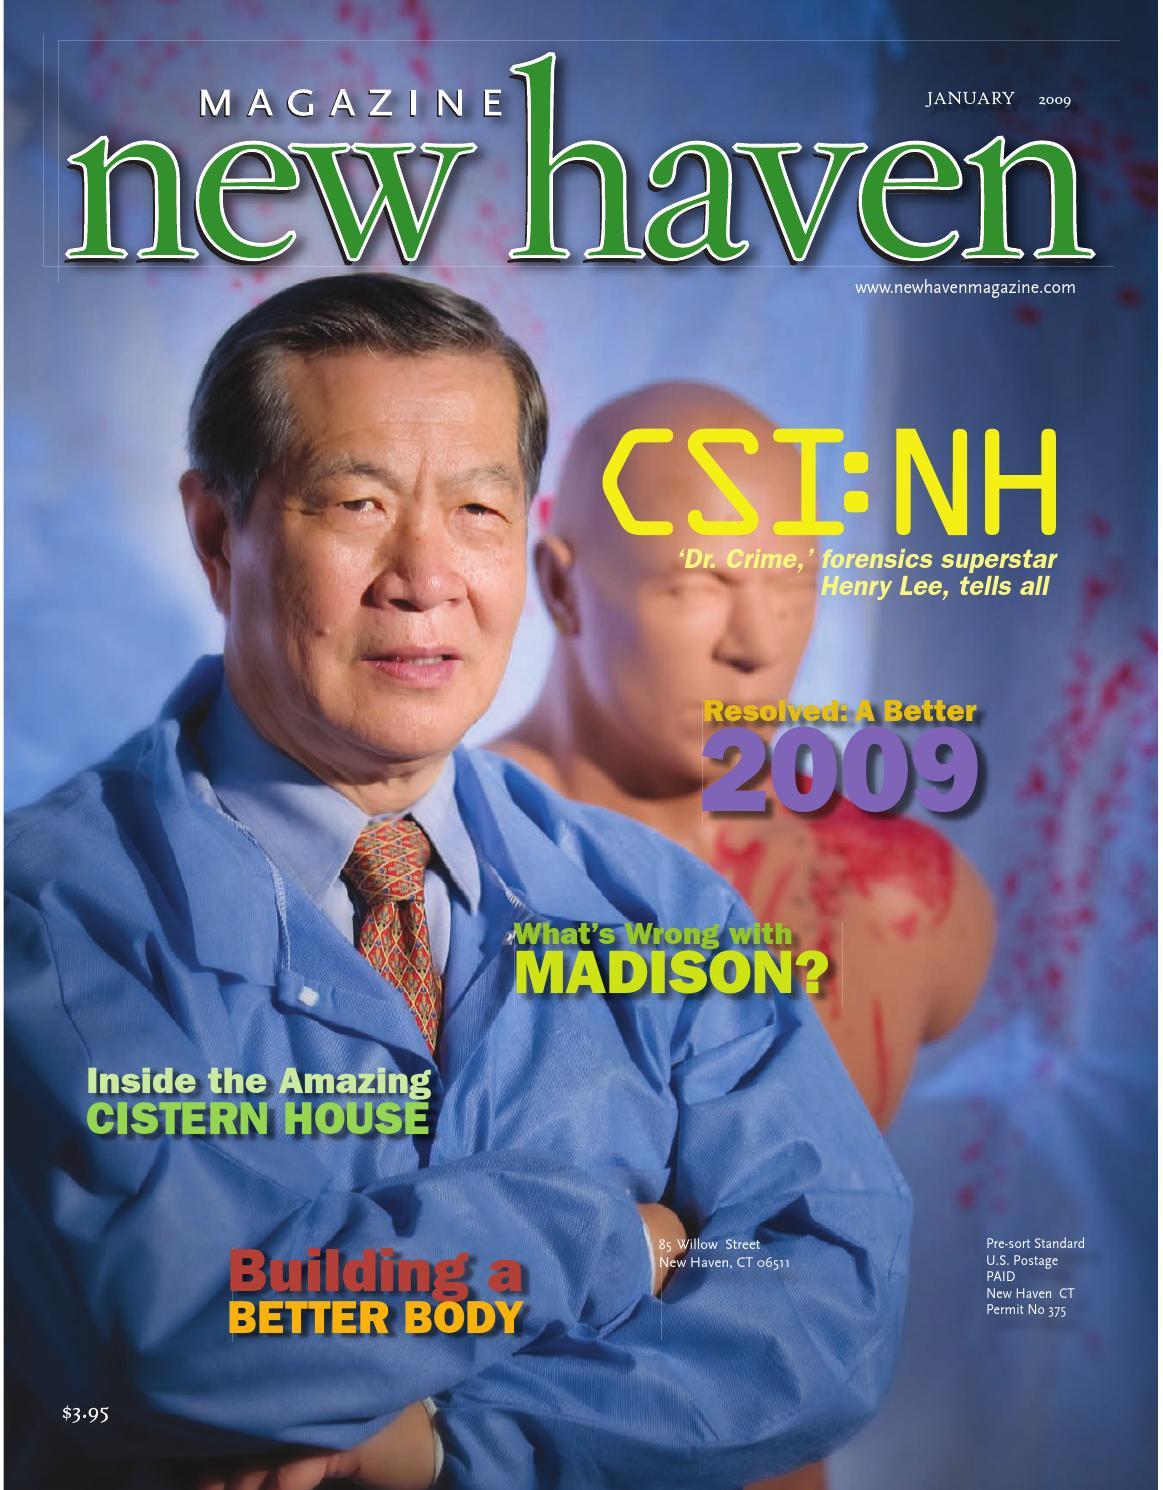 New Haven magazine January 2009 by Second Wind Media Ltd - issuu 88af2d62b